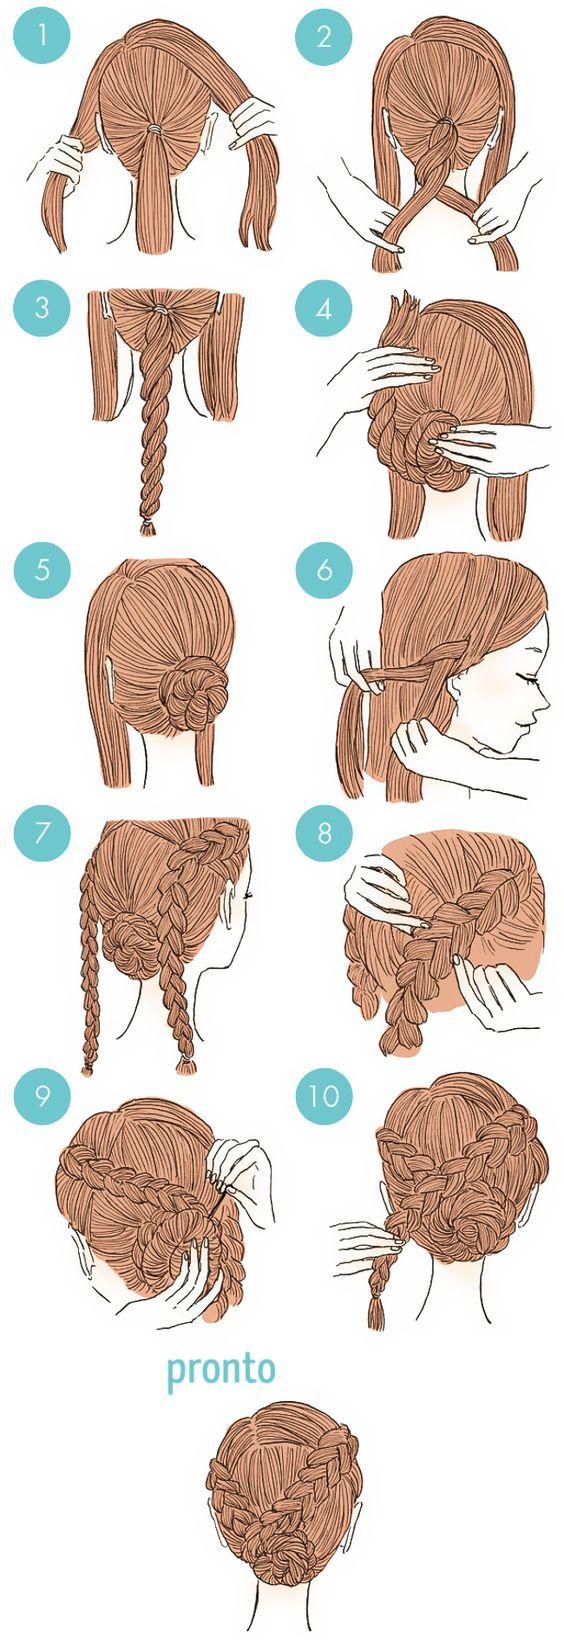 20 Penteados estilosos que qualquer menina consegue fazer: Follow yonce & get posts on the daily @hayleybyu